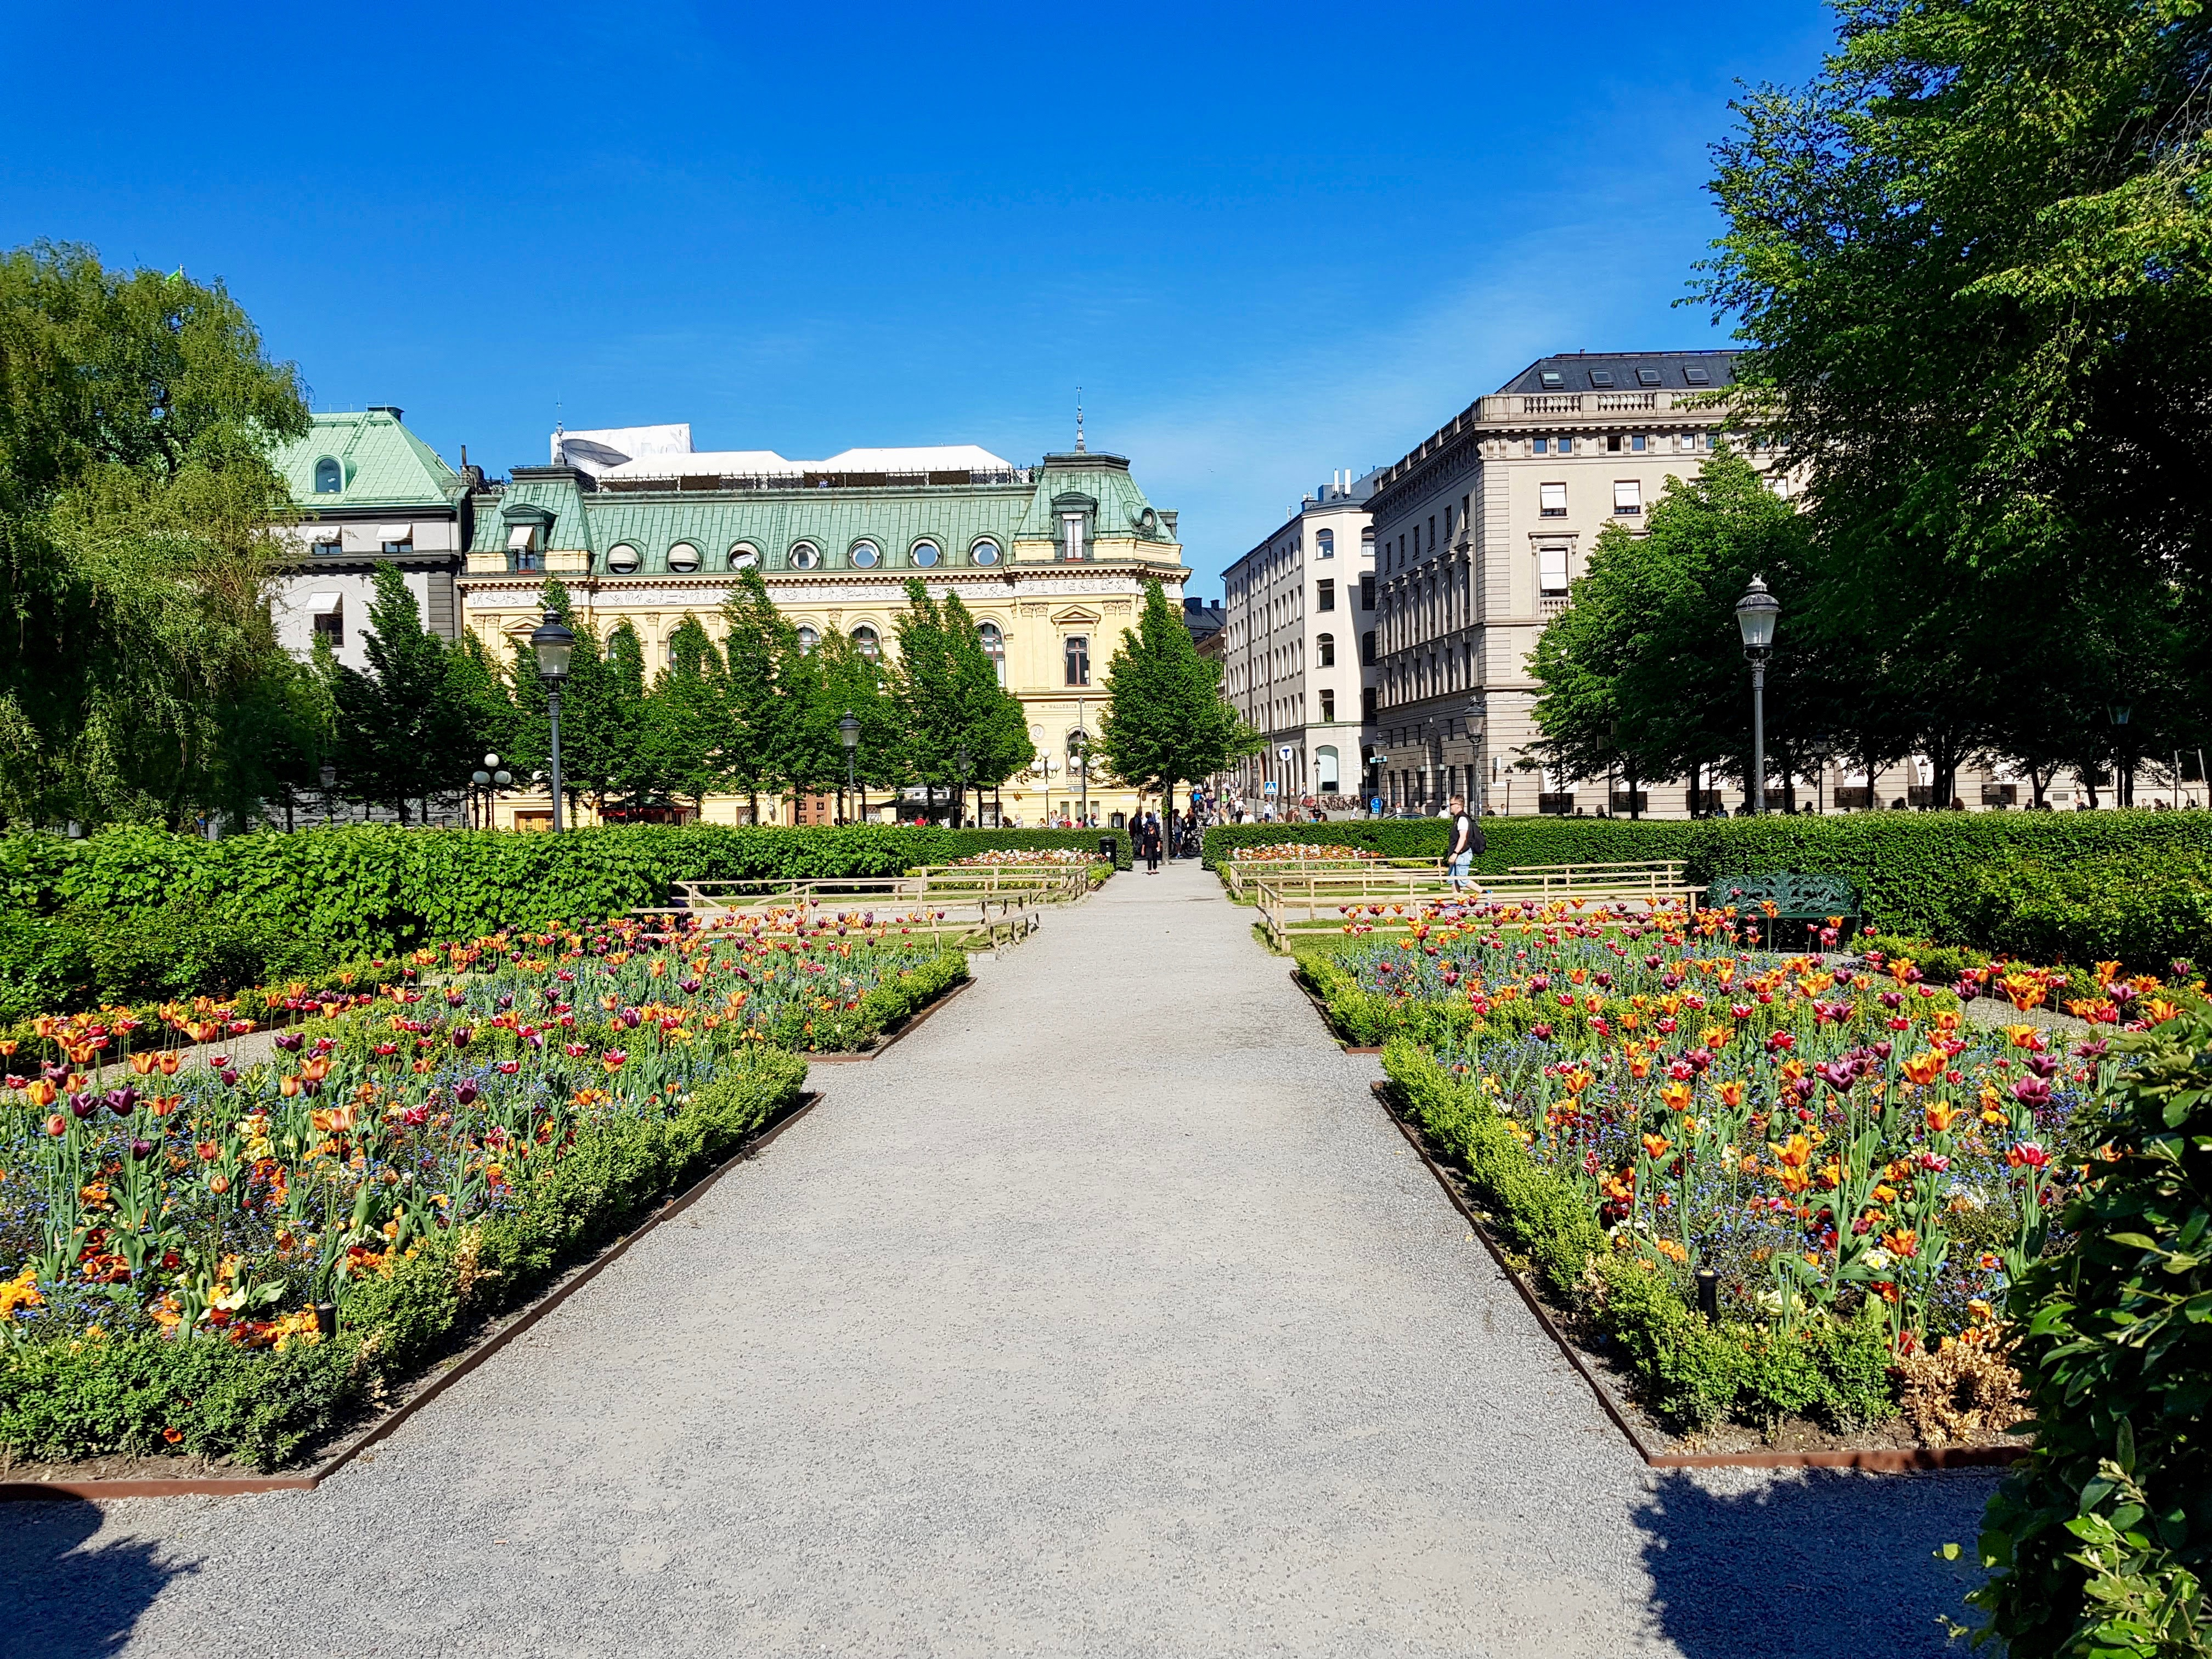 Stockholm spring 2018 by Ingemar Pongratz